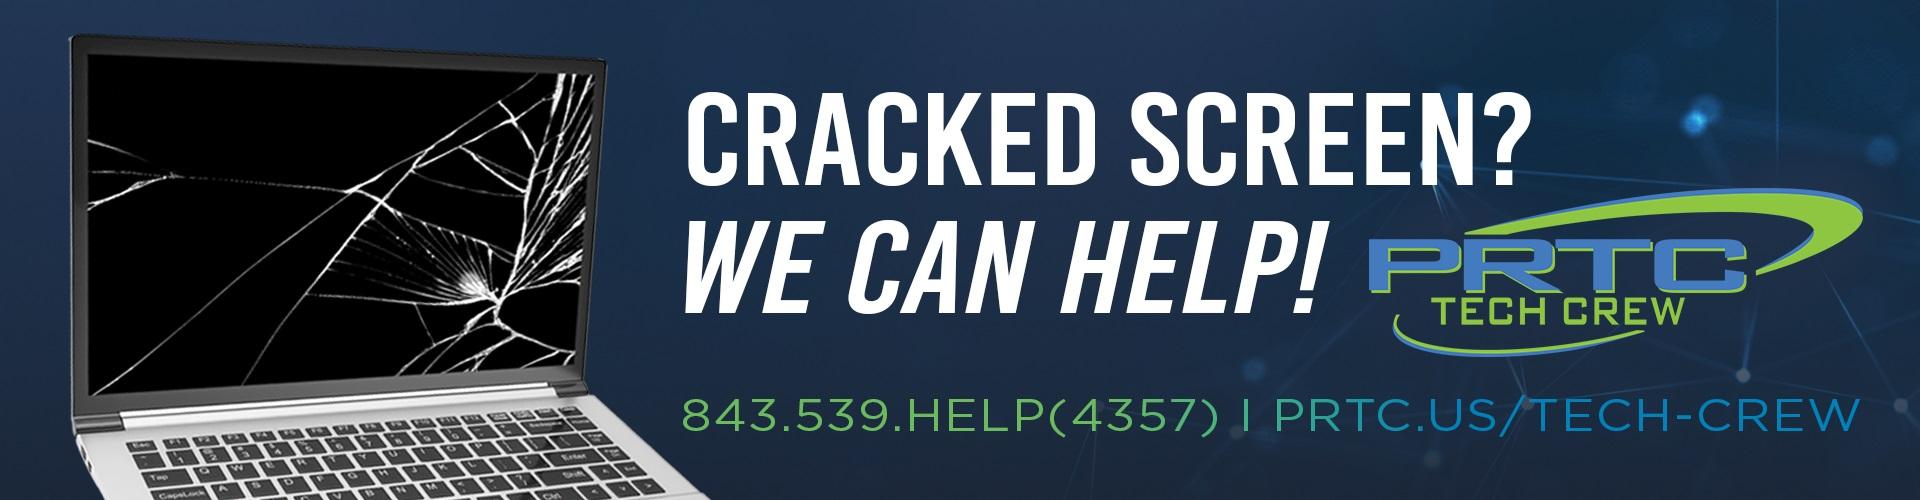 Cracked Screen?